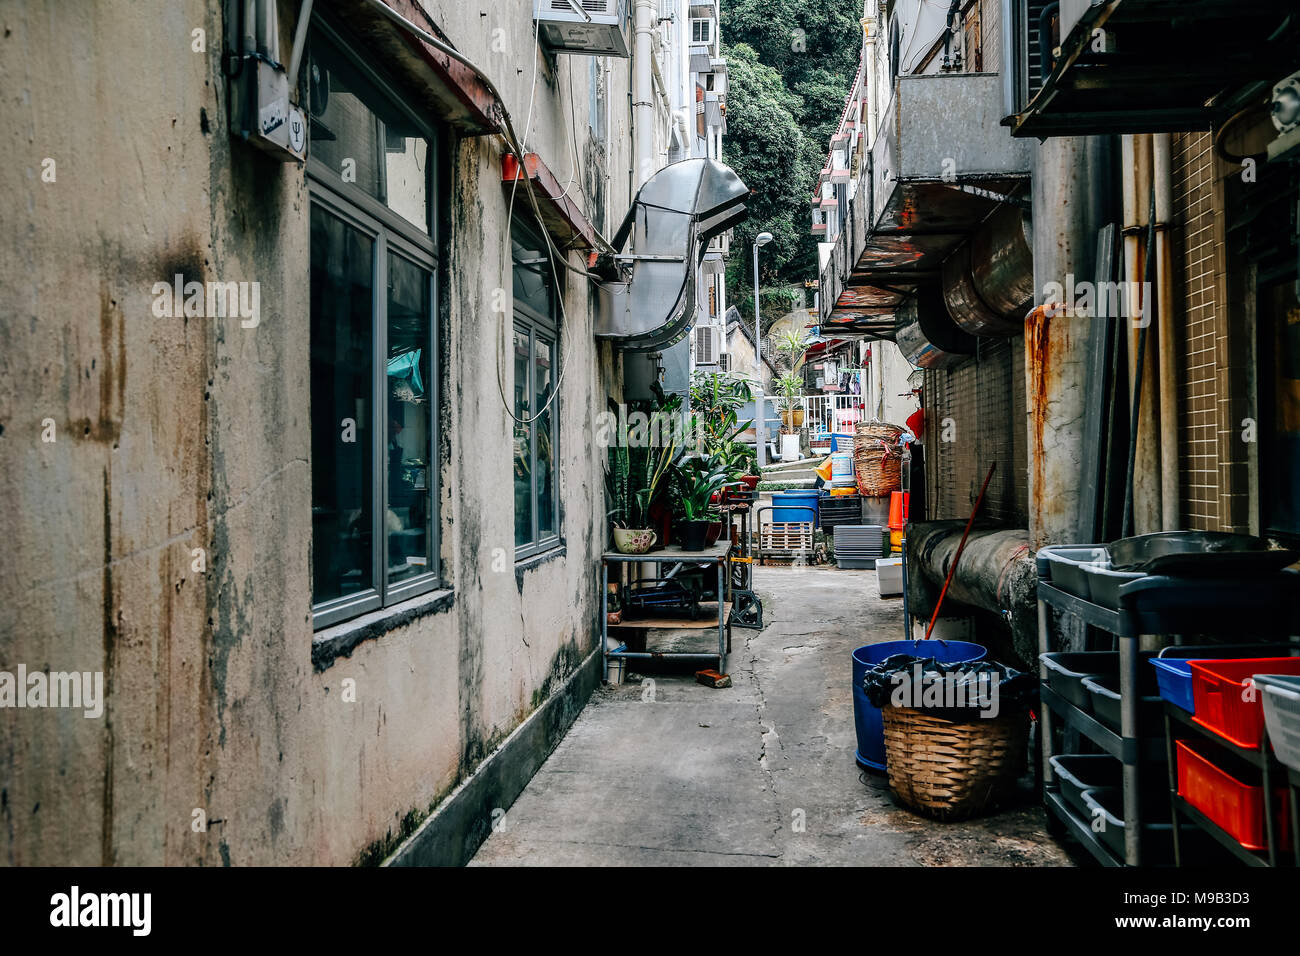 Back alley of restaurant at Lamma island village in HongKong - Stock Image